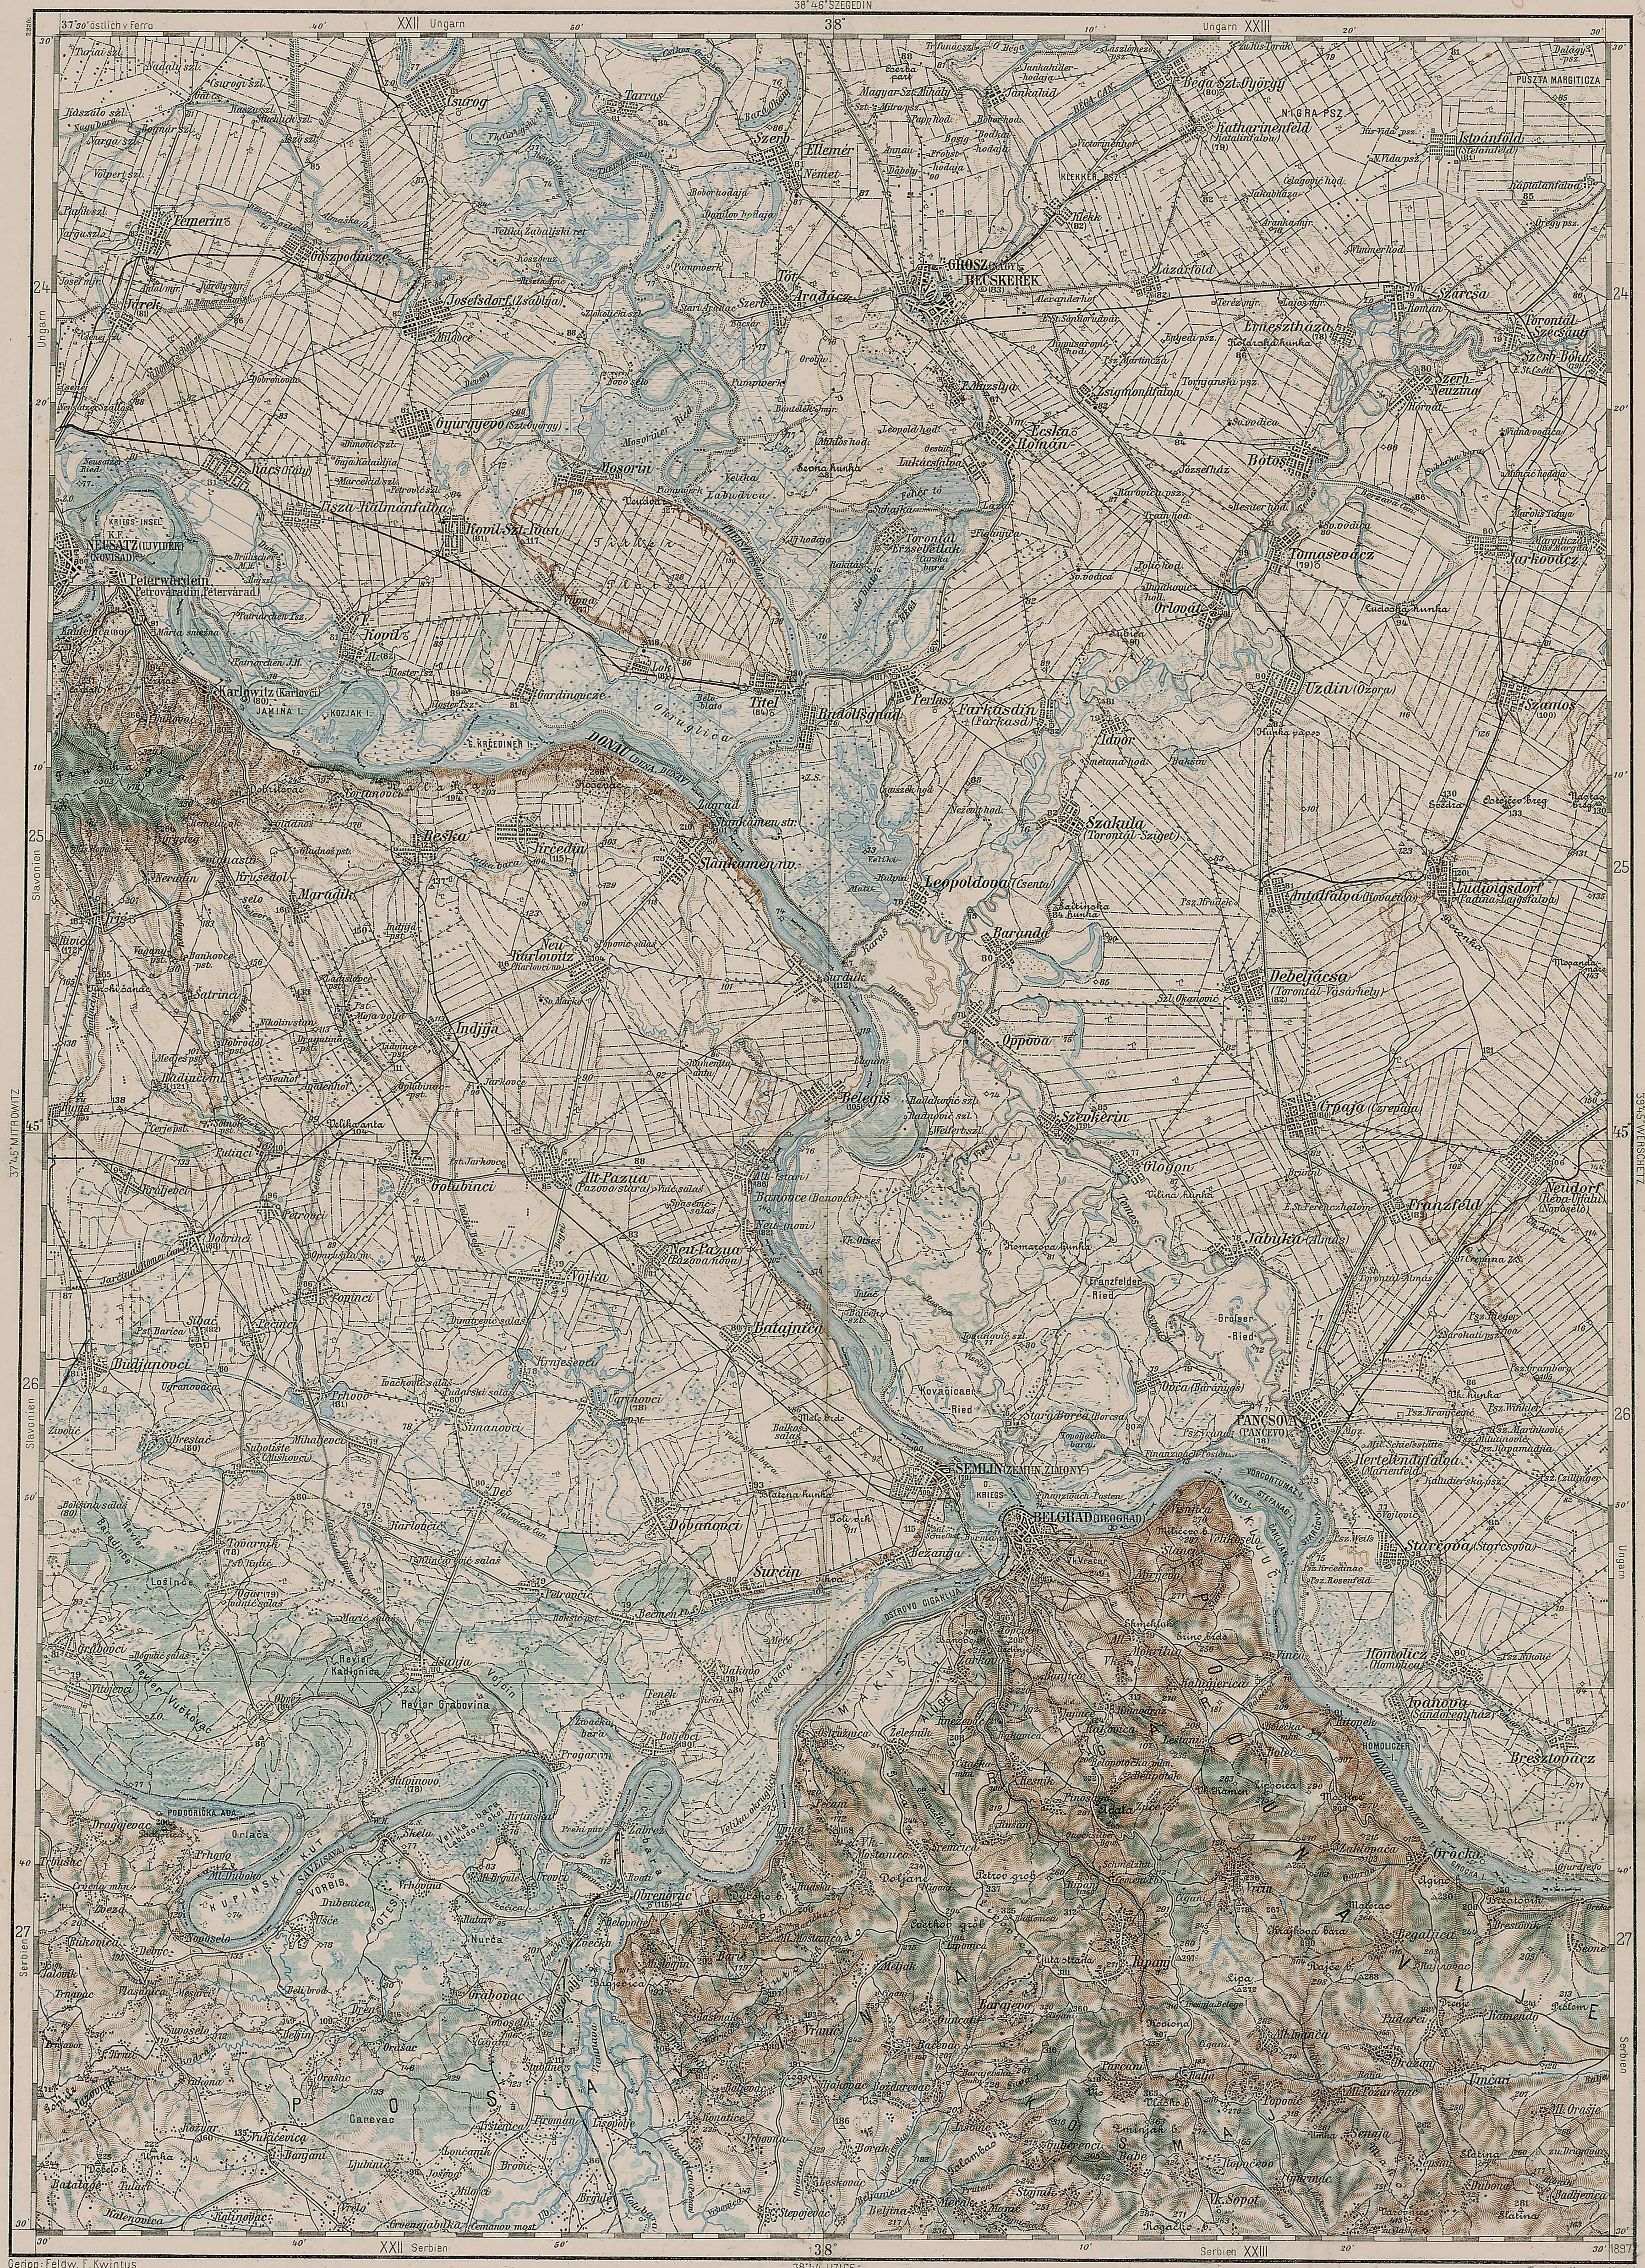 Radixhub Banatski Despotovac Maps